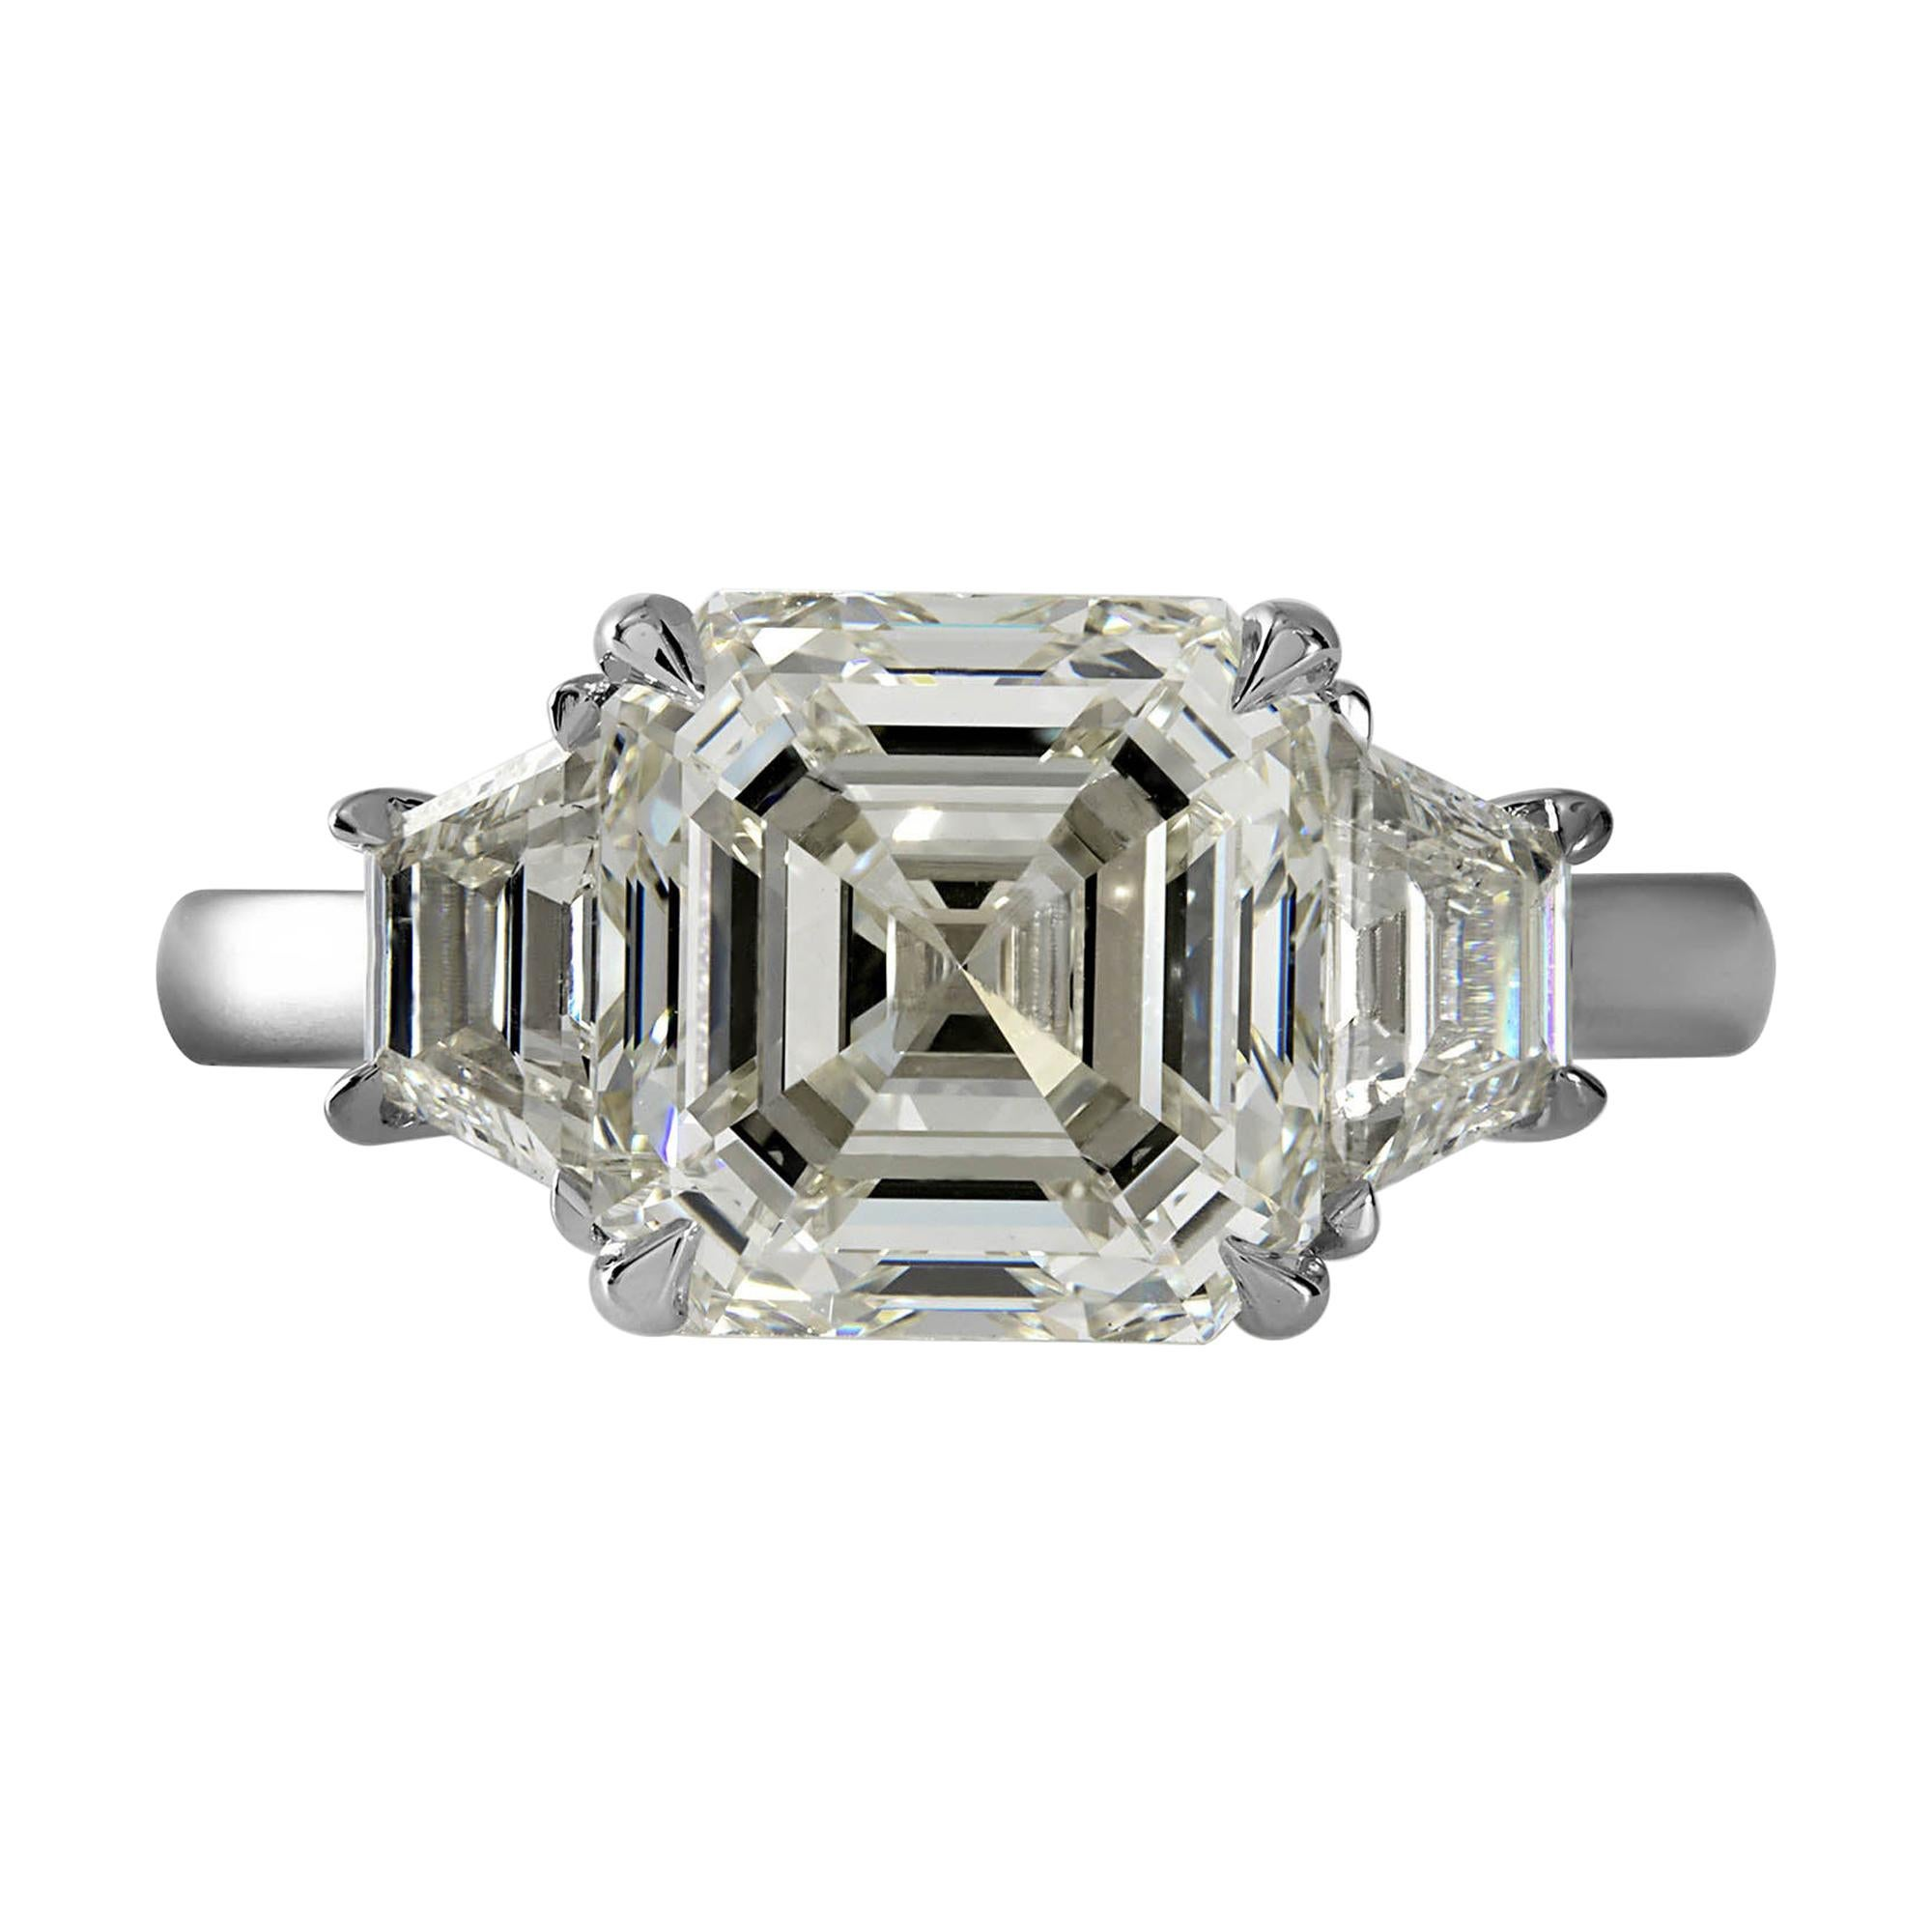 GIA Shy 5 Ct Estate Vintage Asscher Diamond 3 Stone Engagement Wedding Platinum